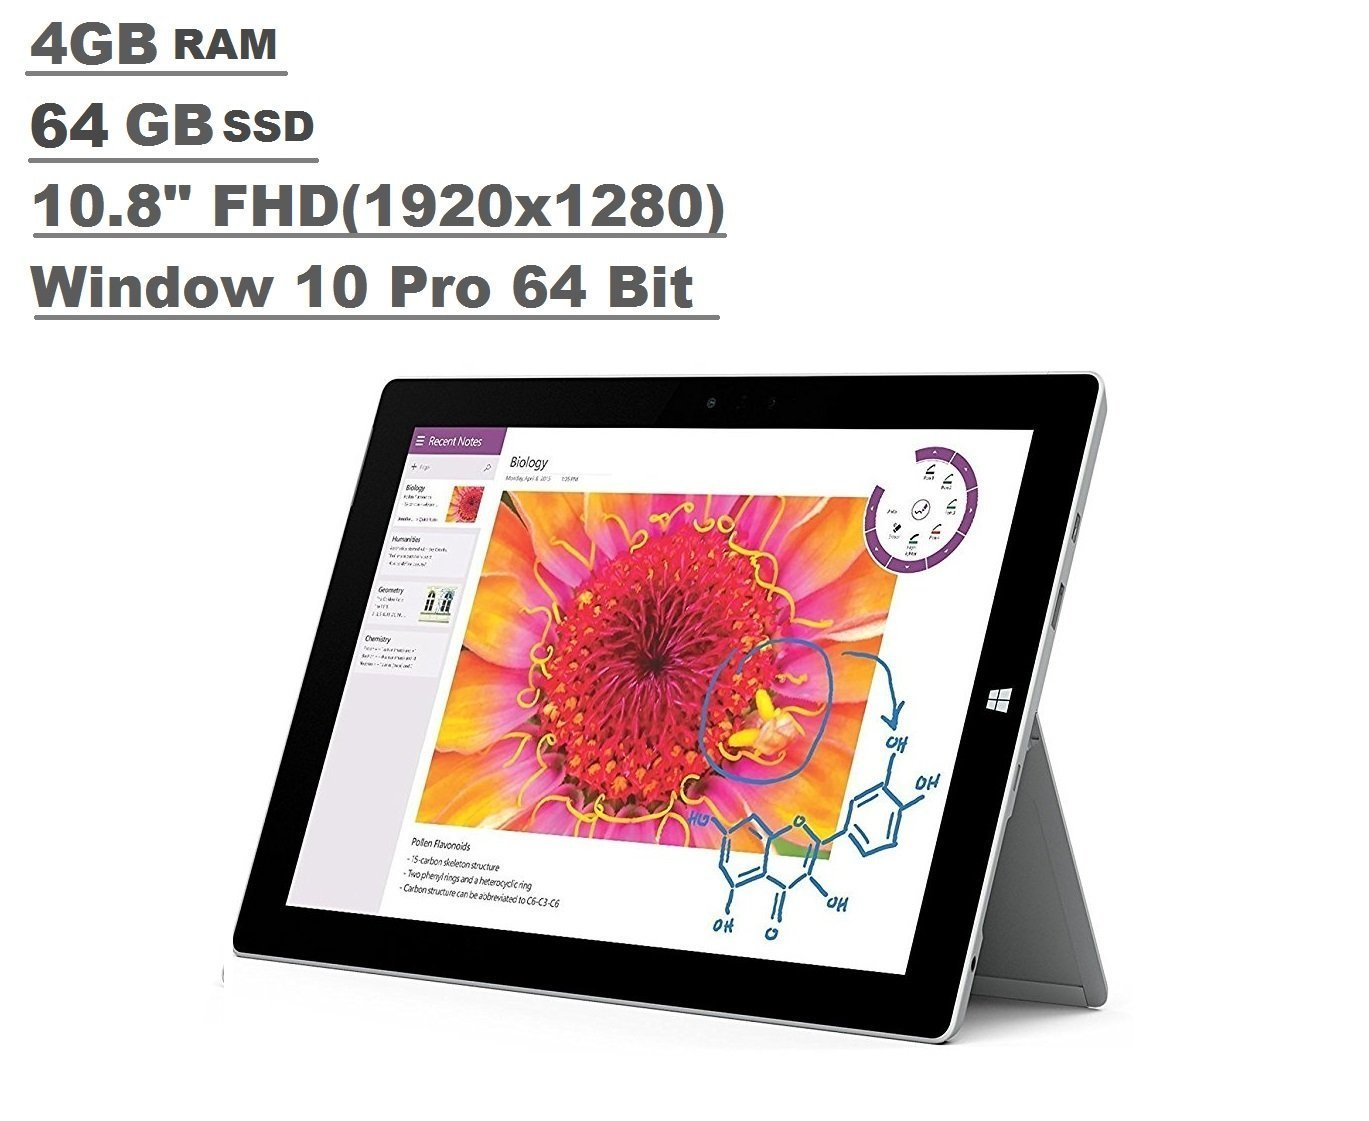 Microsoft Surface 3 Tablet (10.8-inch FHD (1920x1280), 4GB RAM, 64GB SSD, Intel Atom 1.6Ghz, Windows 10 Professional 64 Bit) (Certified Refurbished)